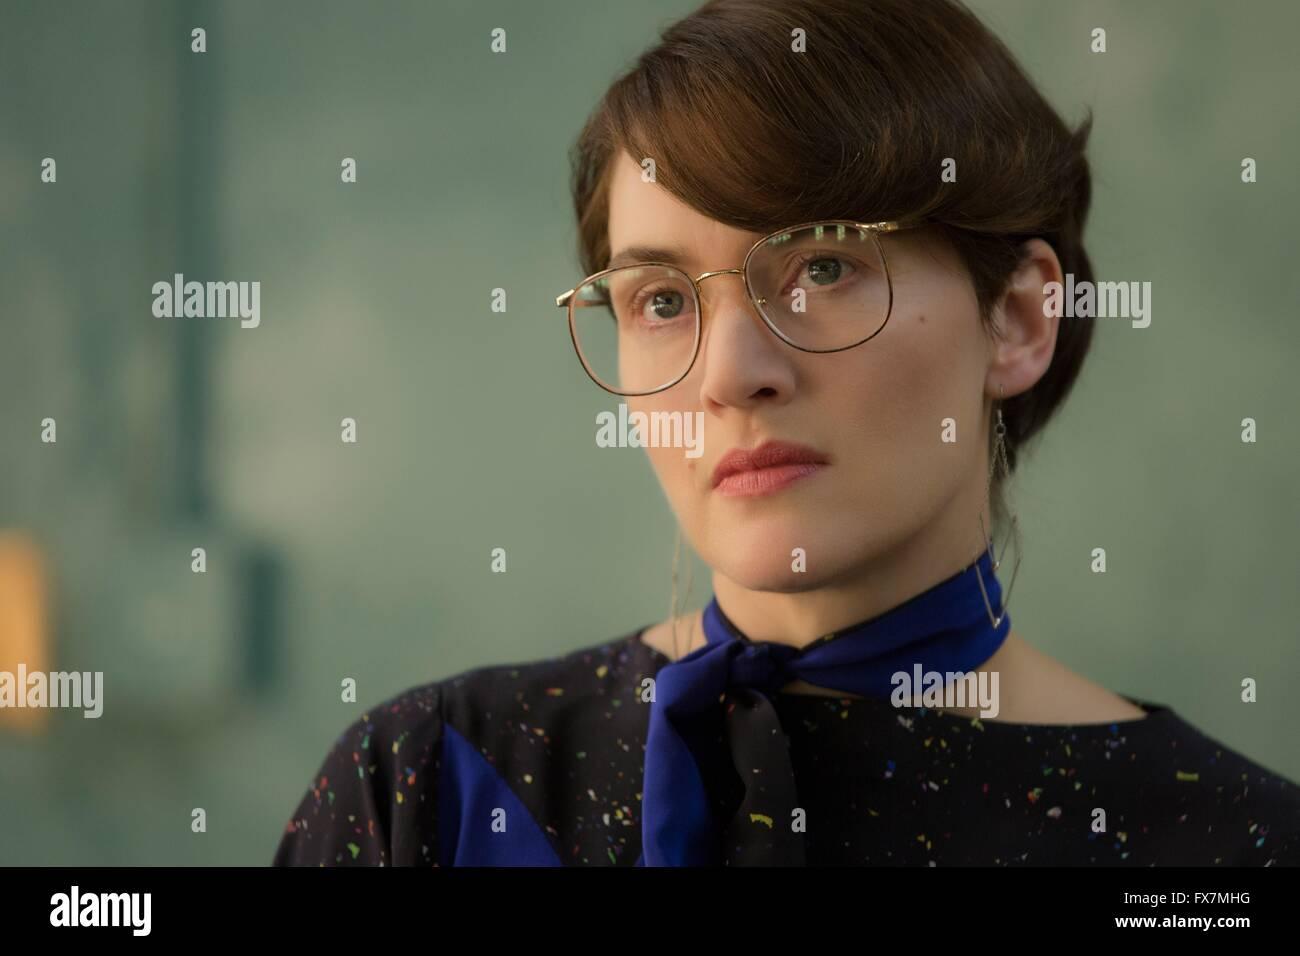 Steve Jobs Year : 2016 USA / UK Director : Danny Boyle Kate Winslet - Stock Image